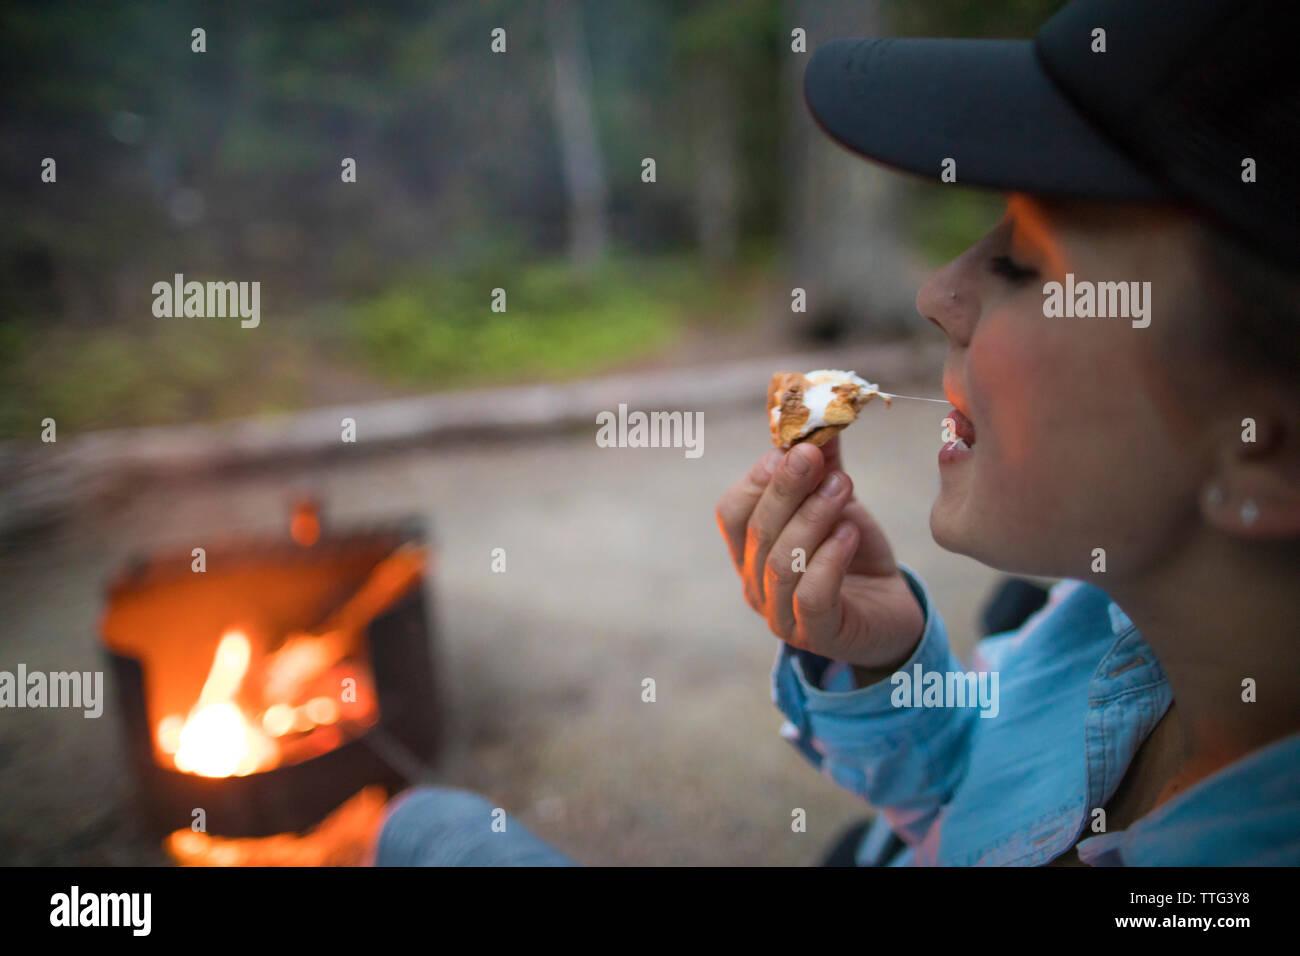 Woman eating smore while camping - Stock Image